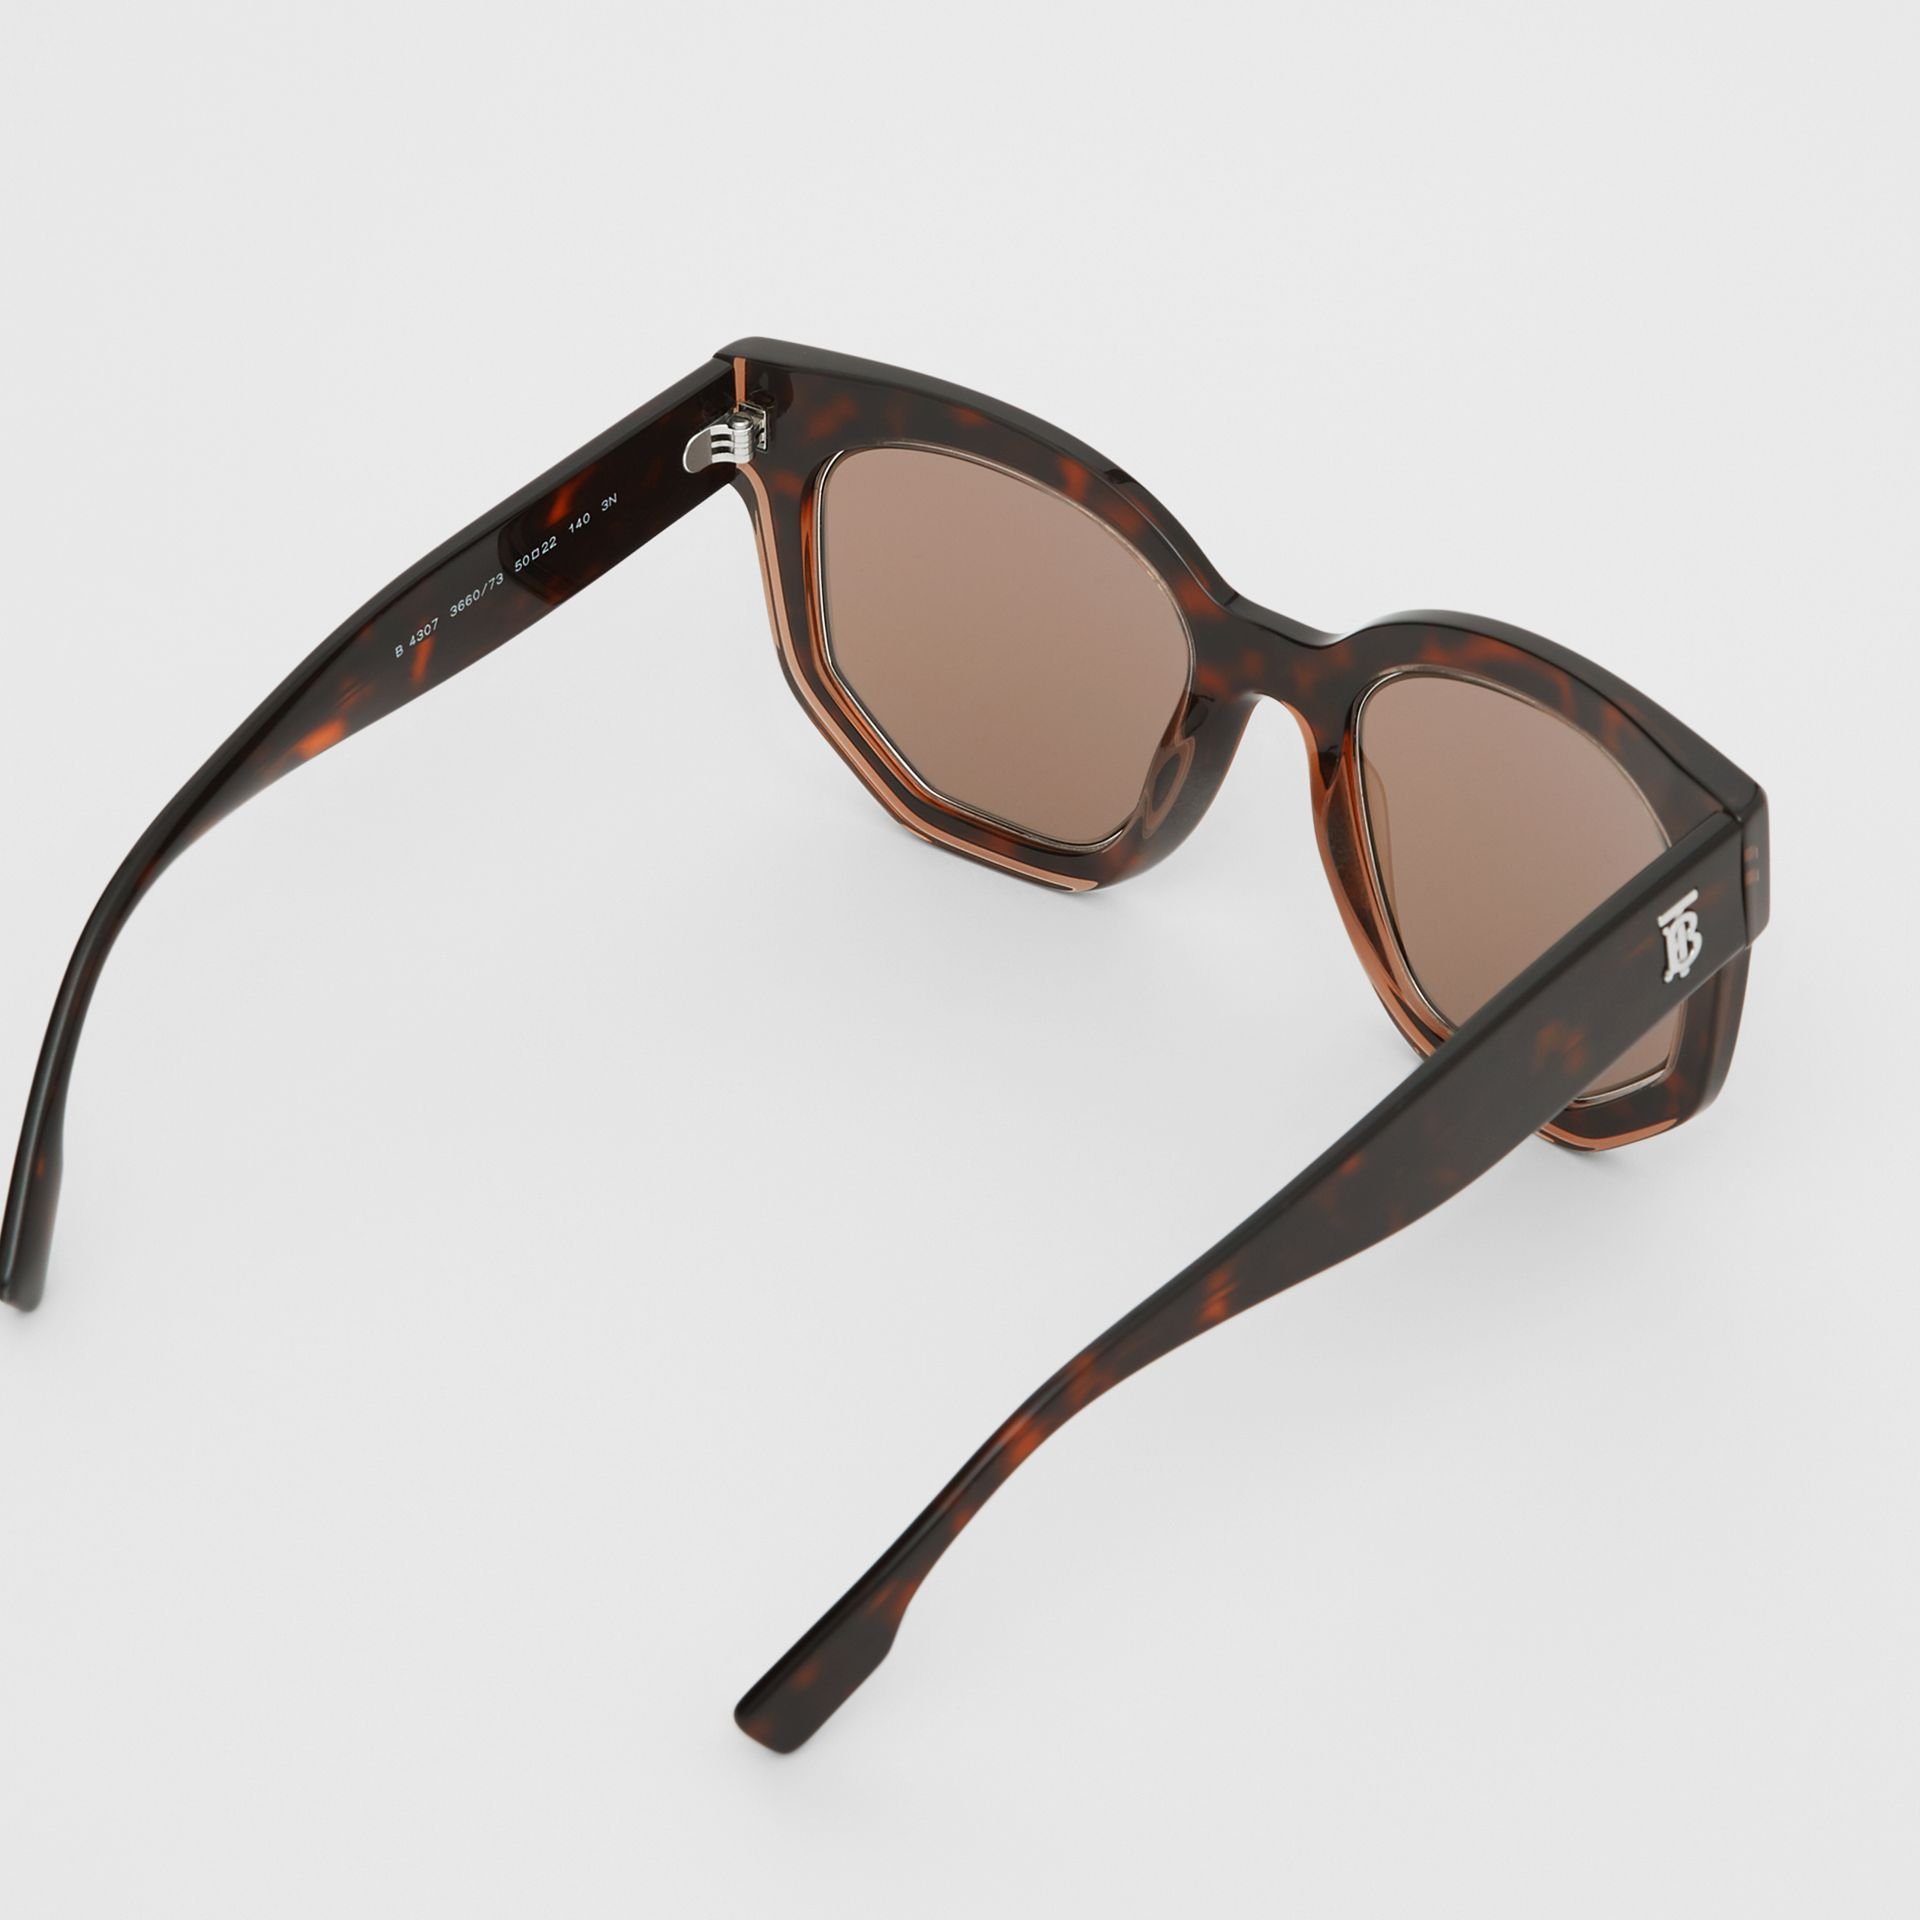 Geometric Frame Sunglasses in Tortoiseshell - Women | Burberry United Kingdom - gallery image 4